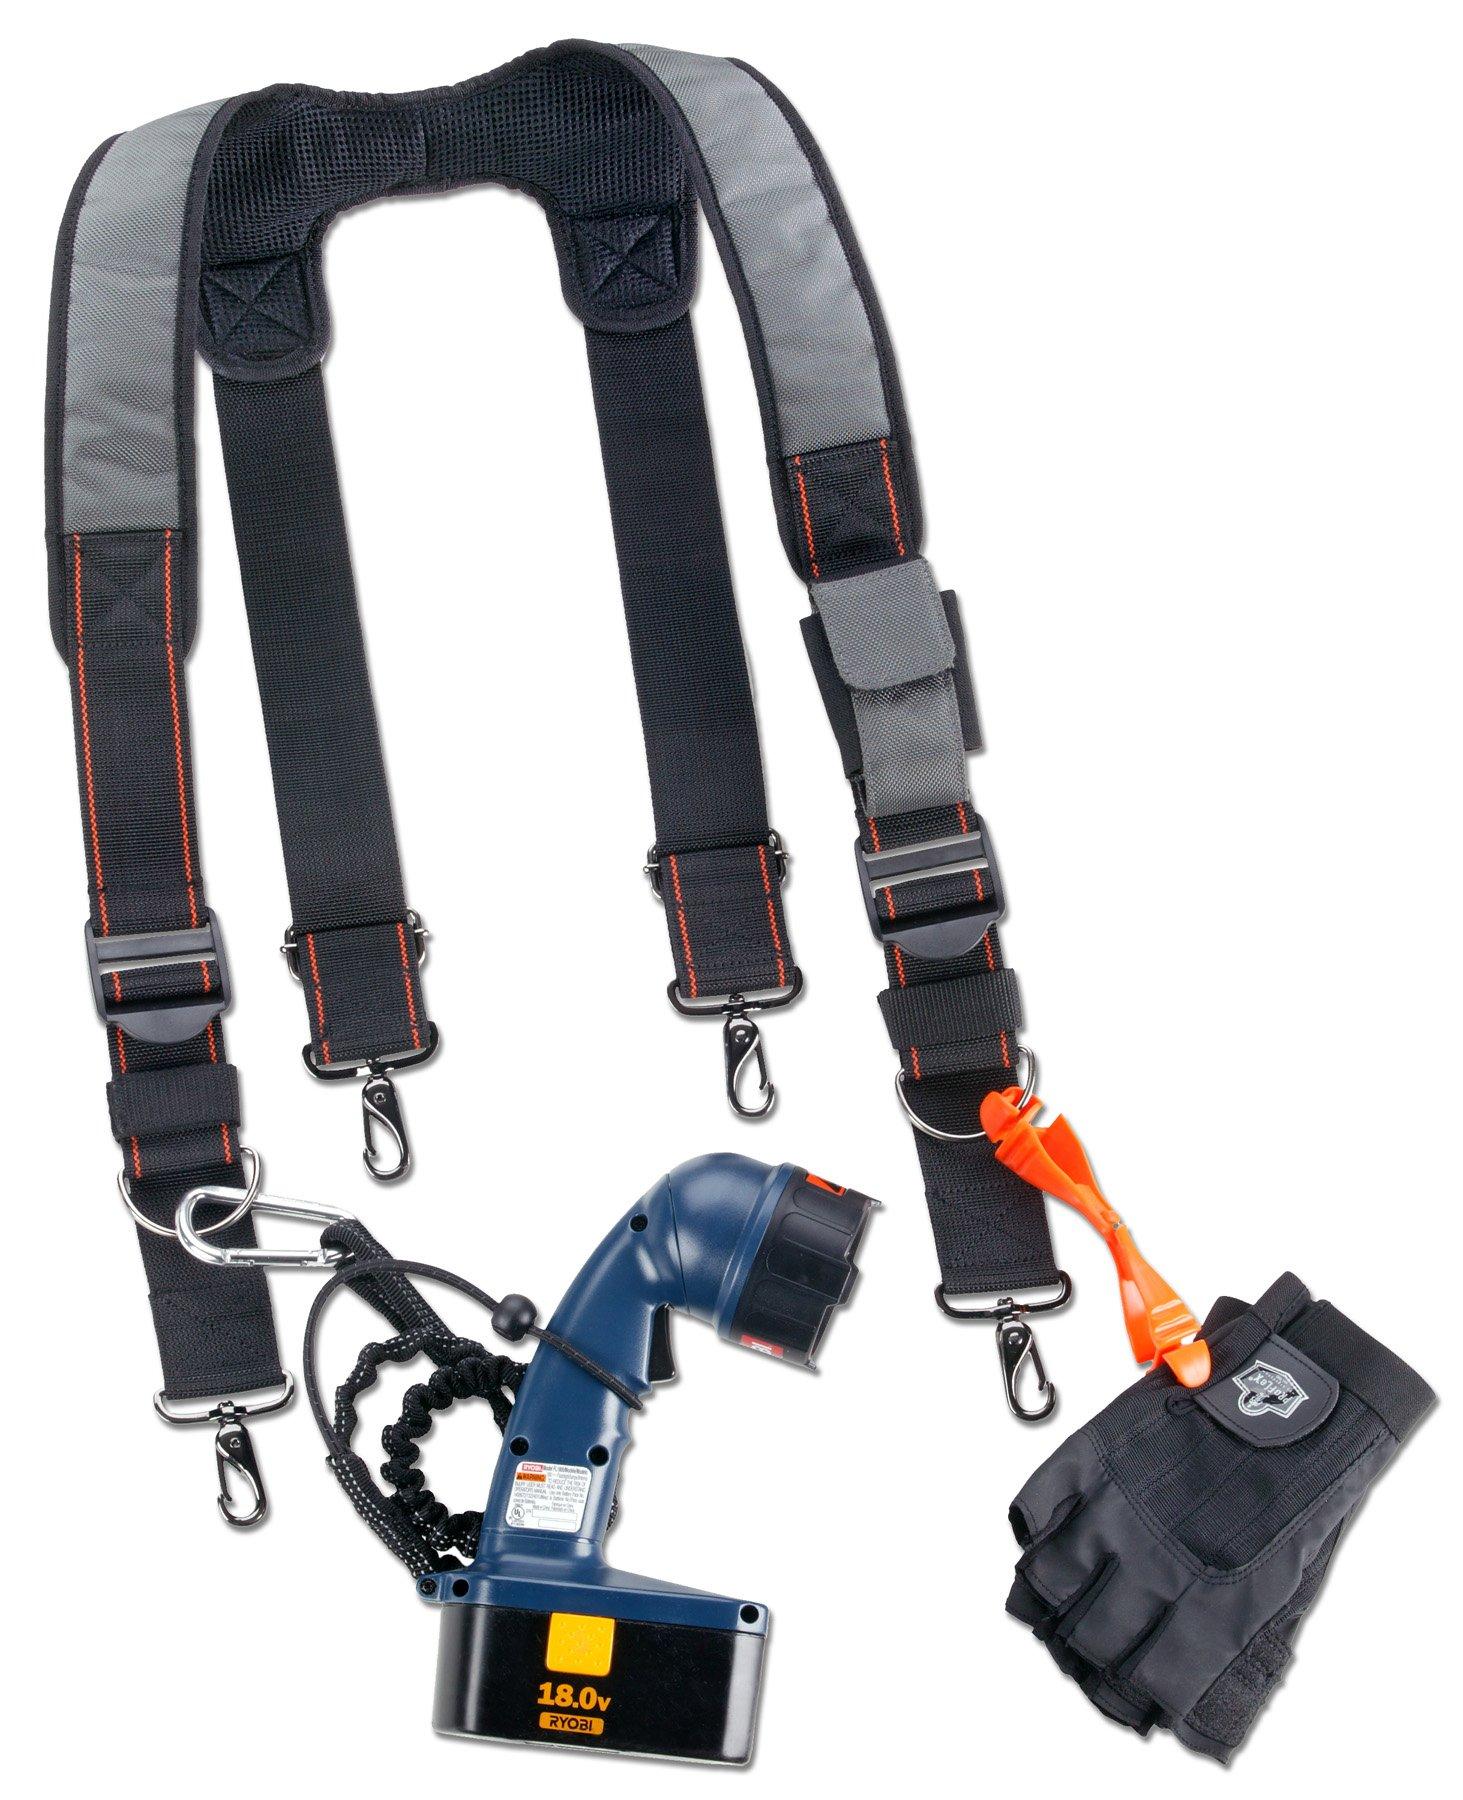 Ergodyne Arsenal 5560 Tool Belt Suspenders, Padded Shoulders, Adjustable by Ergodyne (Image #2)